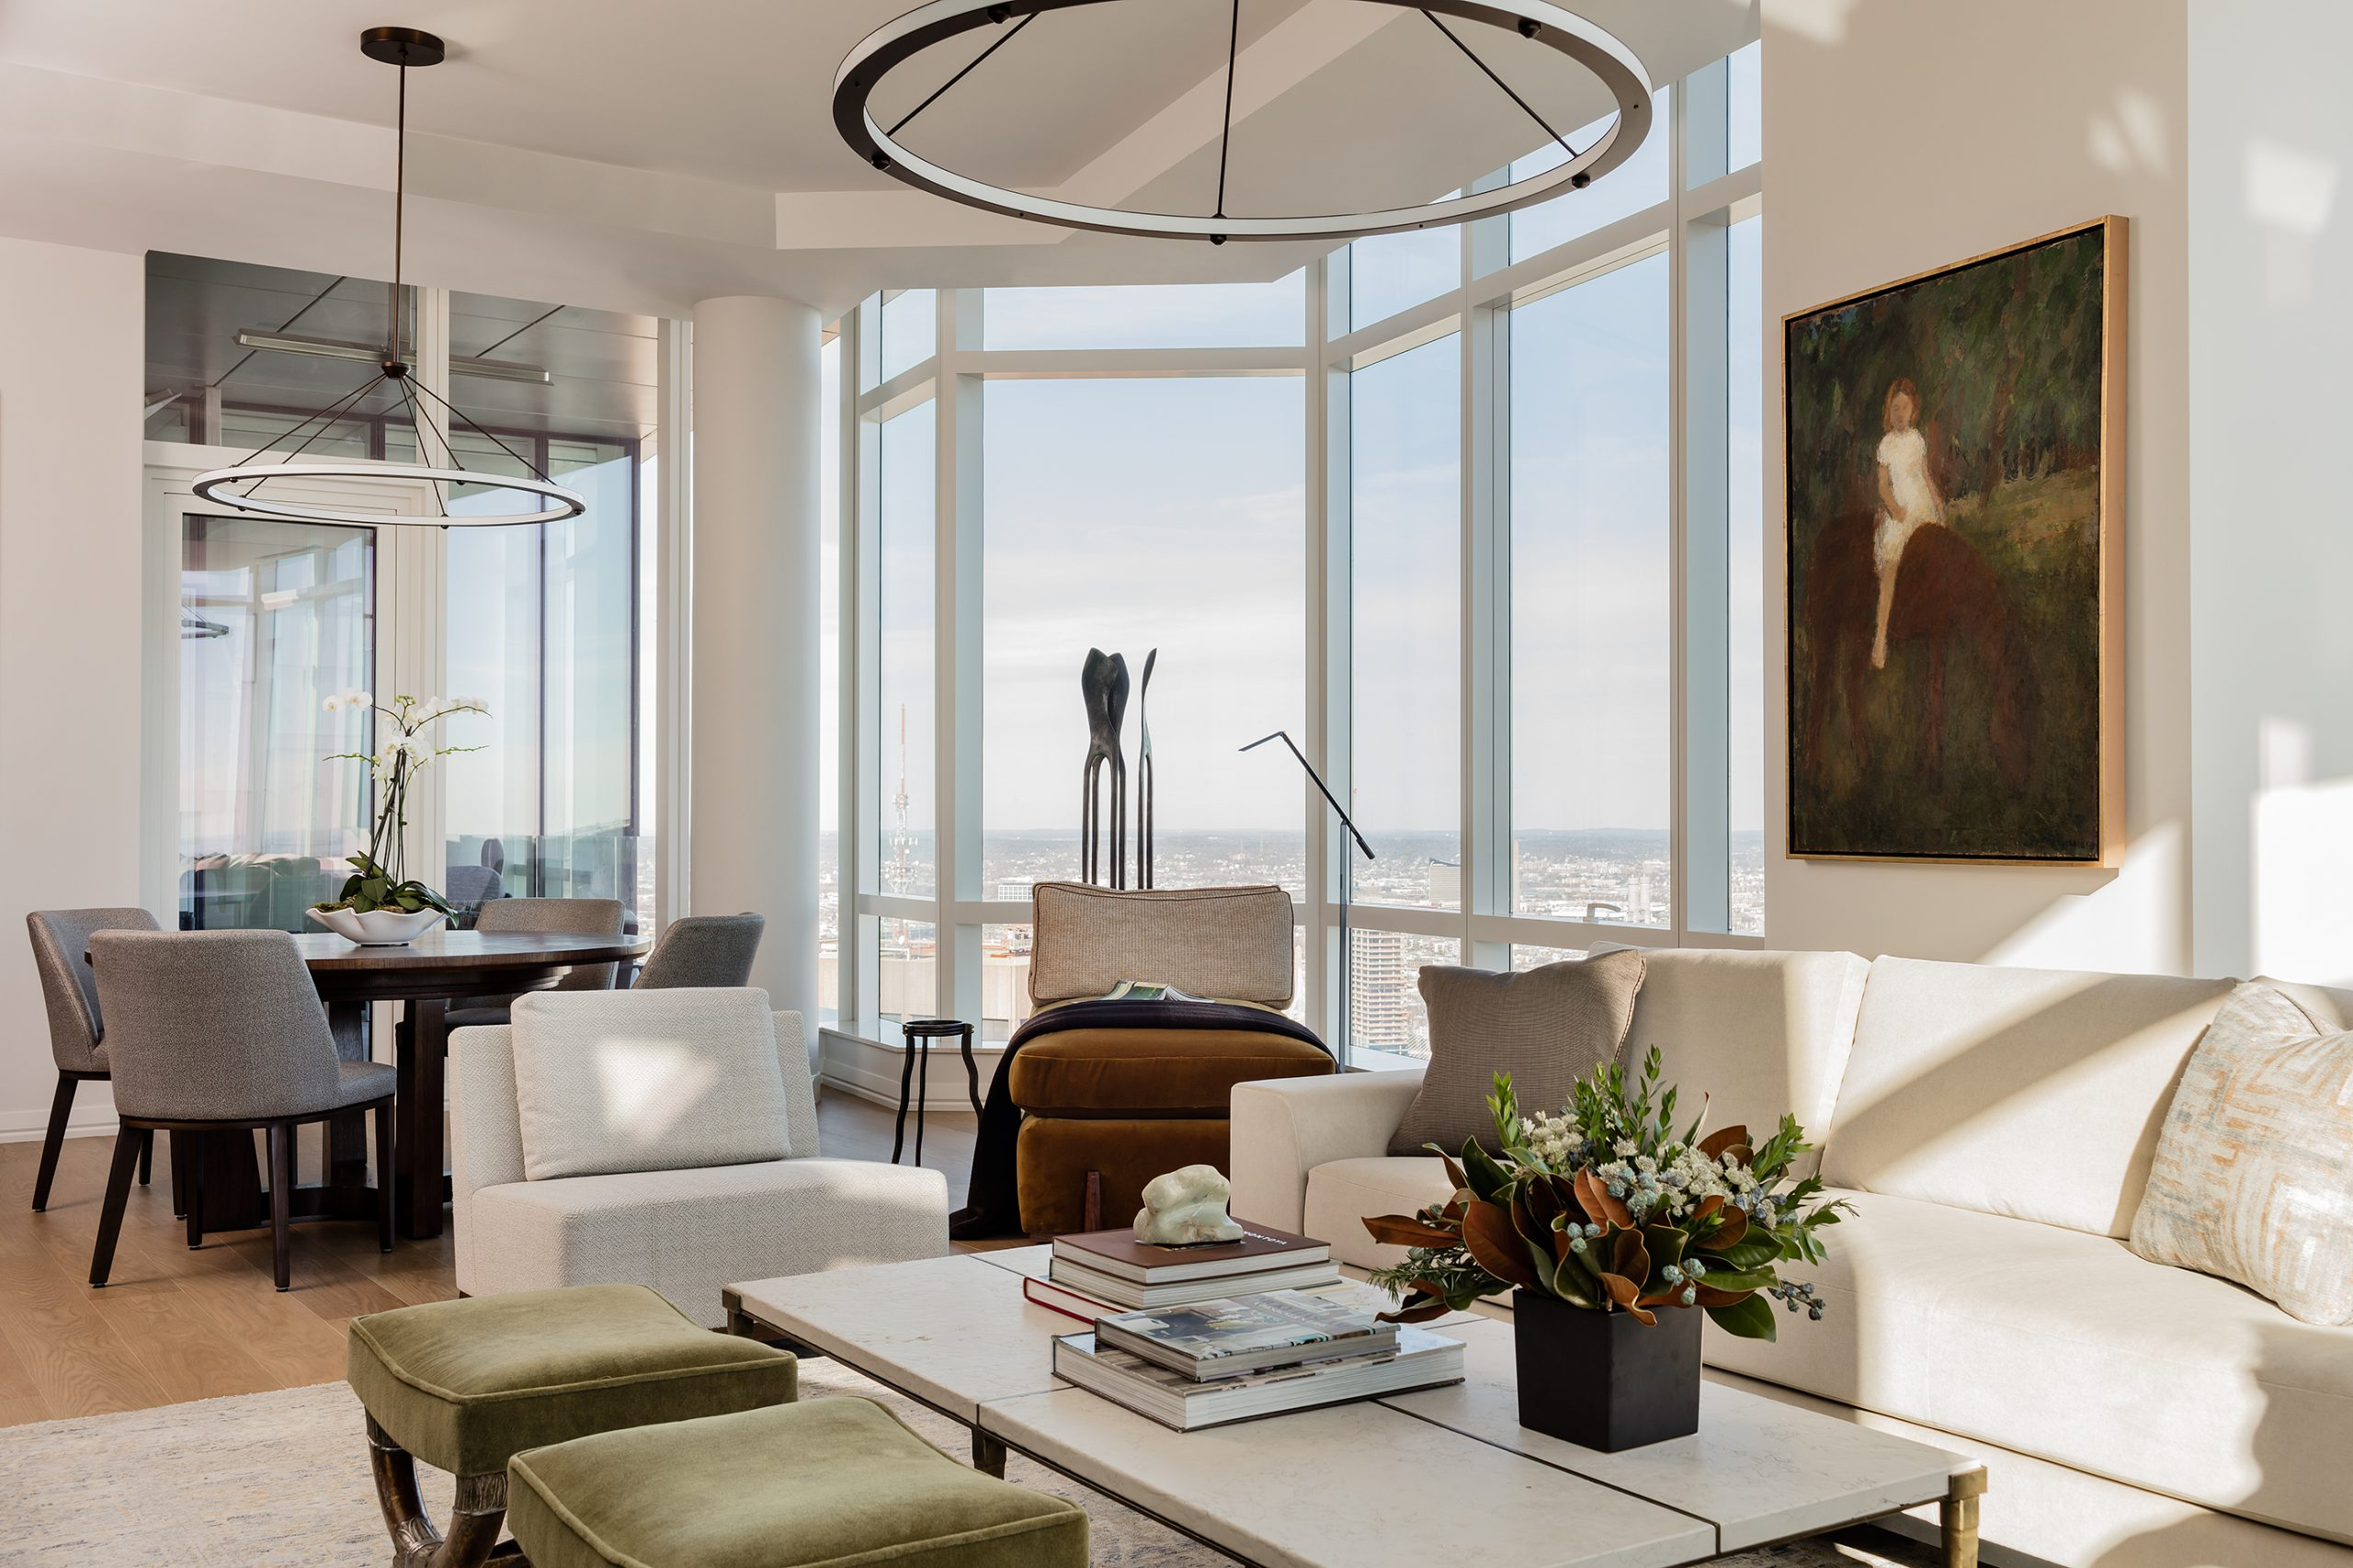 The Best Interior Designers From Boston boston The Best Interior Designers From Boston J7A2399 scaled